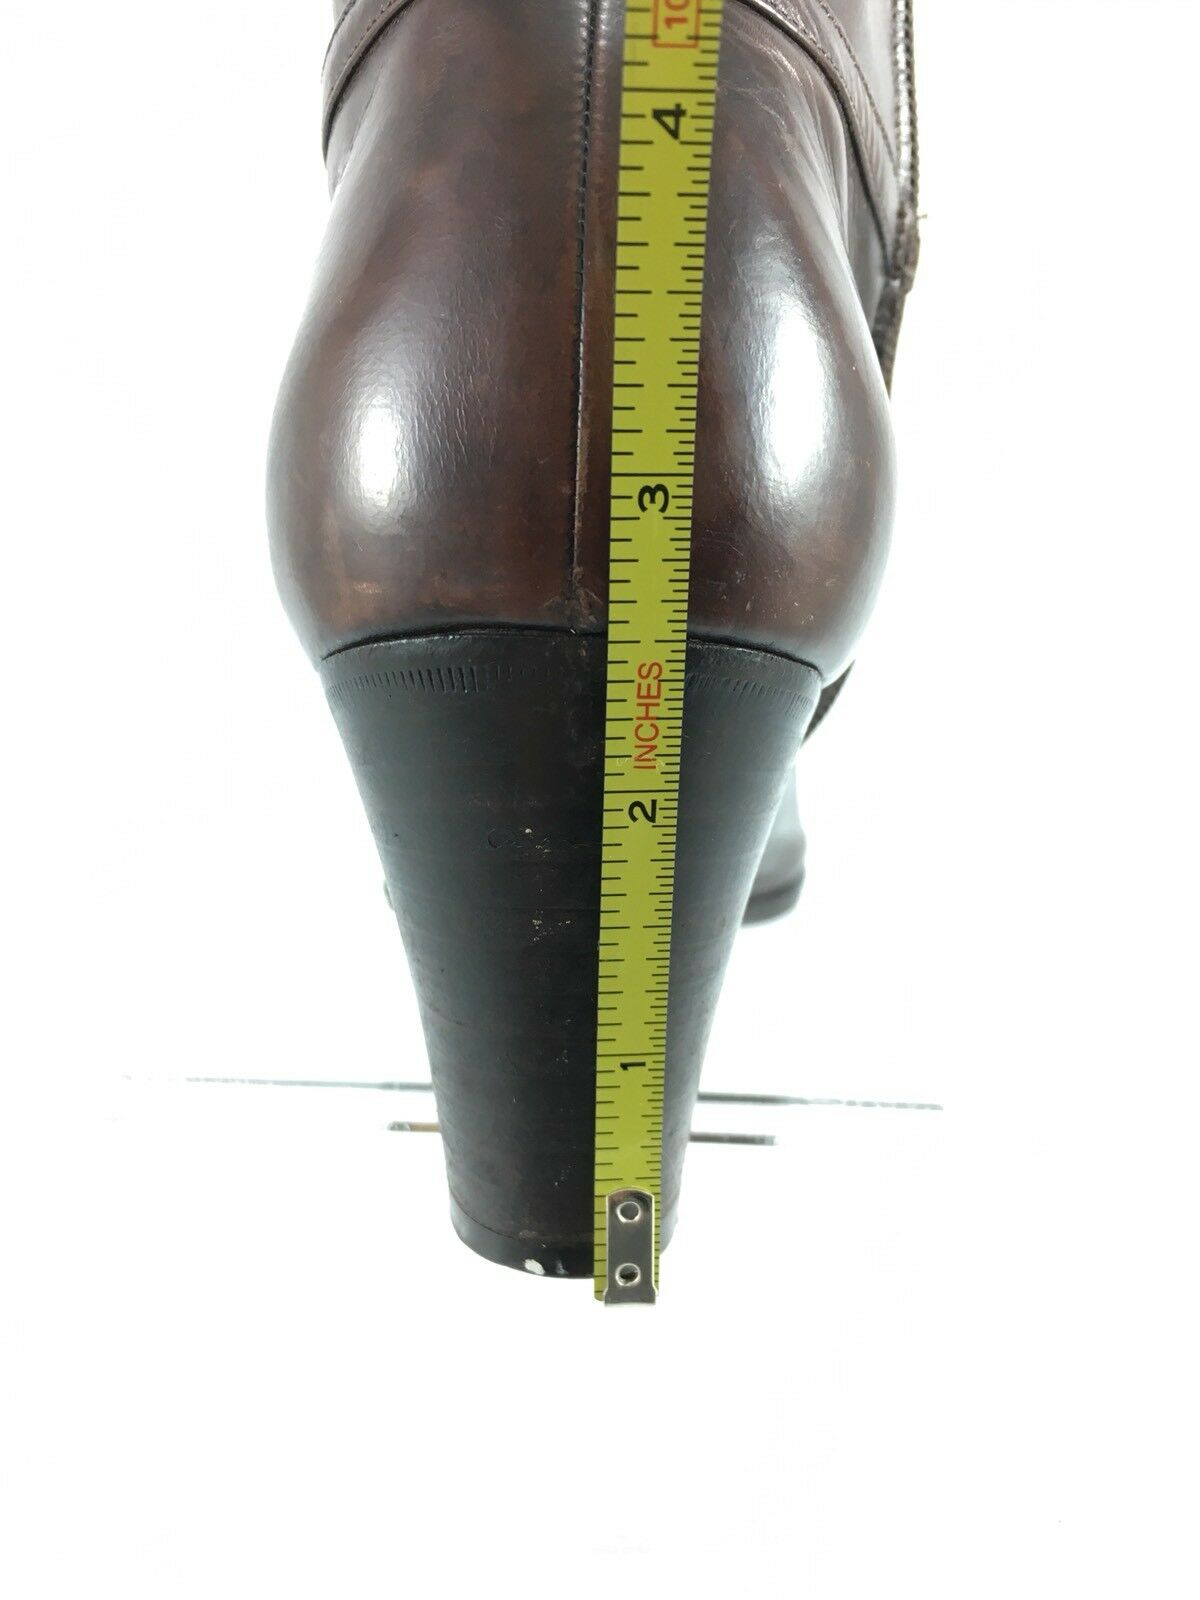 SH8 Salvatore Ferragamo Braun 6M  Braun Ferragamo Leder Tall Stiefel Block Heel Zip b8a40d